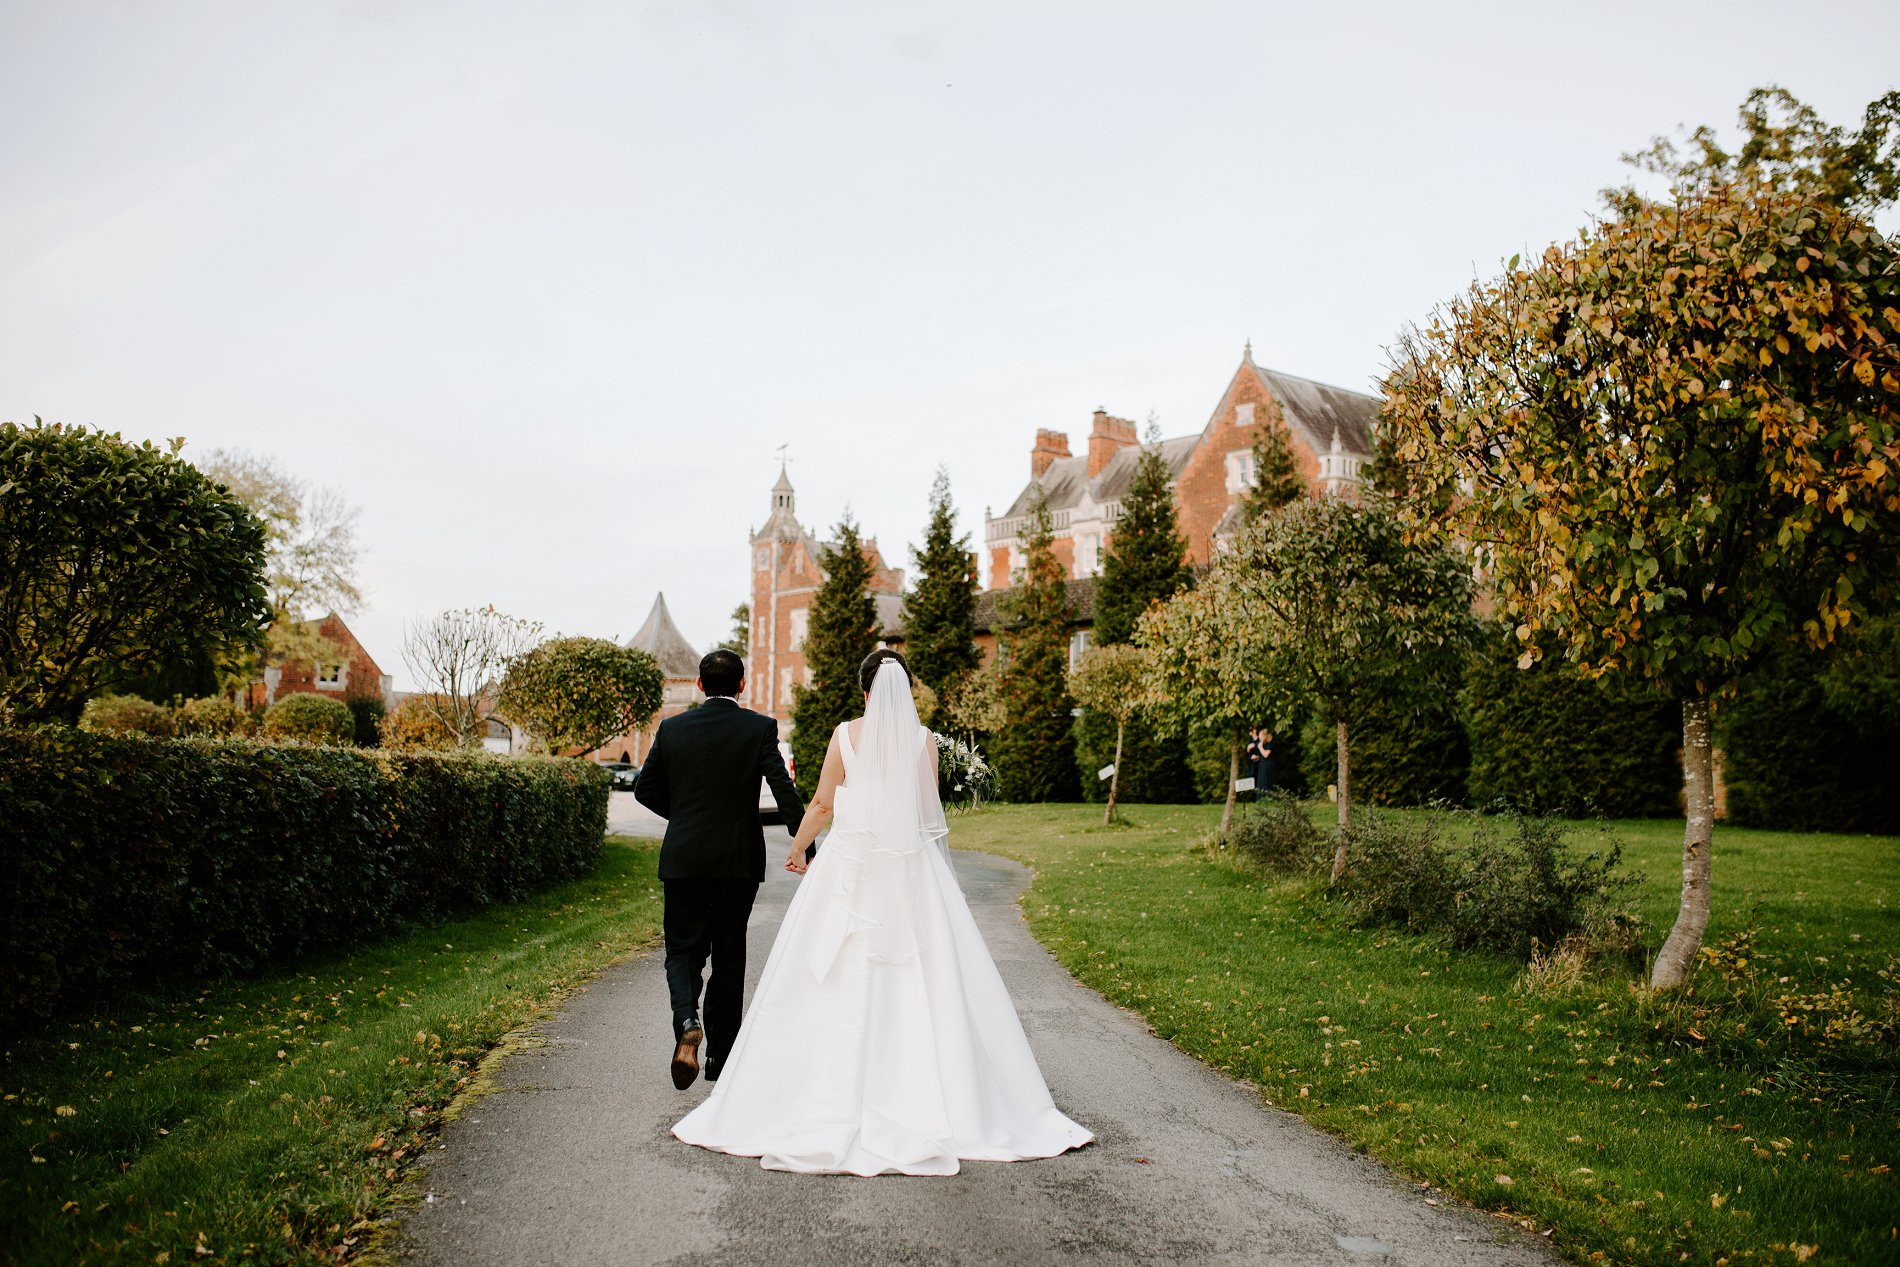 An Elegant White Wedding at Thicket Priory (c) Carla Whittingham Photography (85)